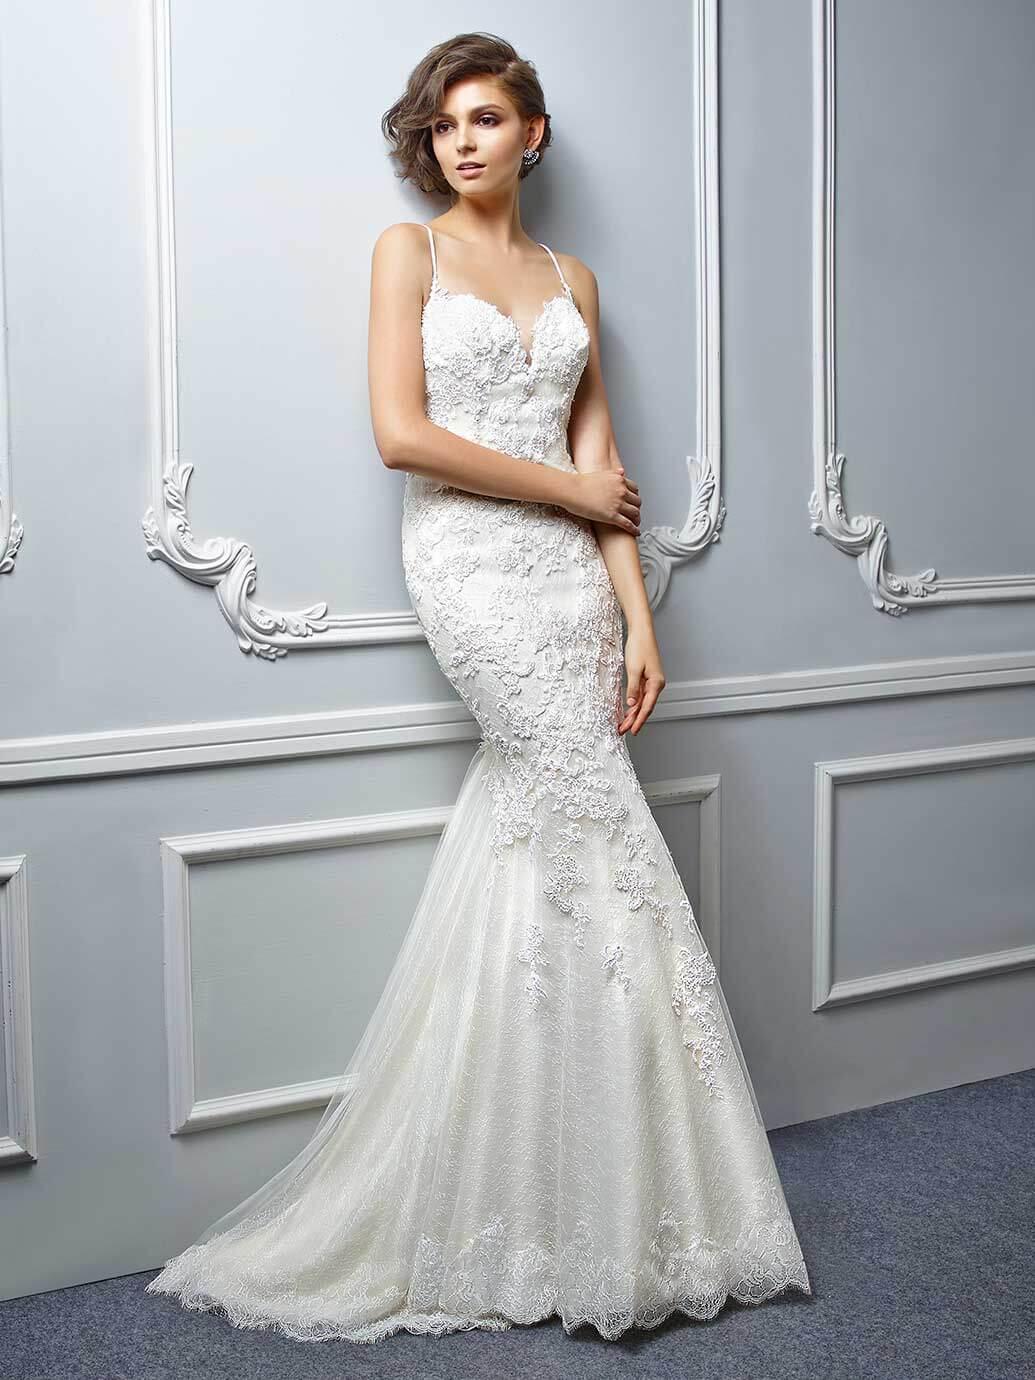 Sample sale ann louise bridal enzoani bt17 17 ombrellifo Gallery